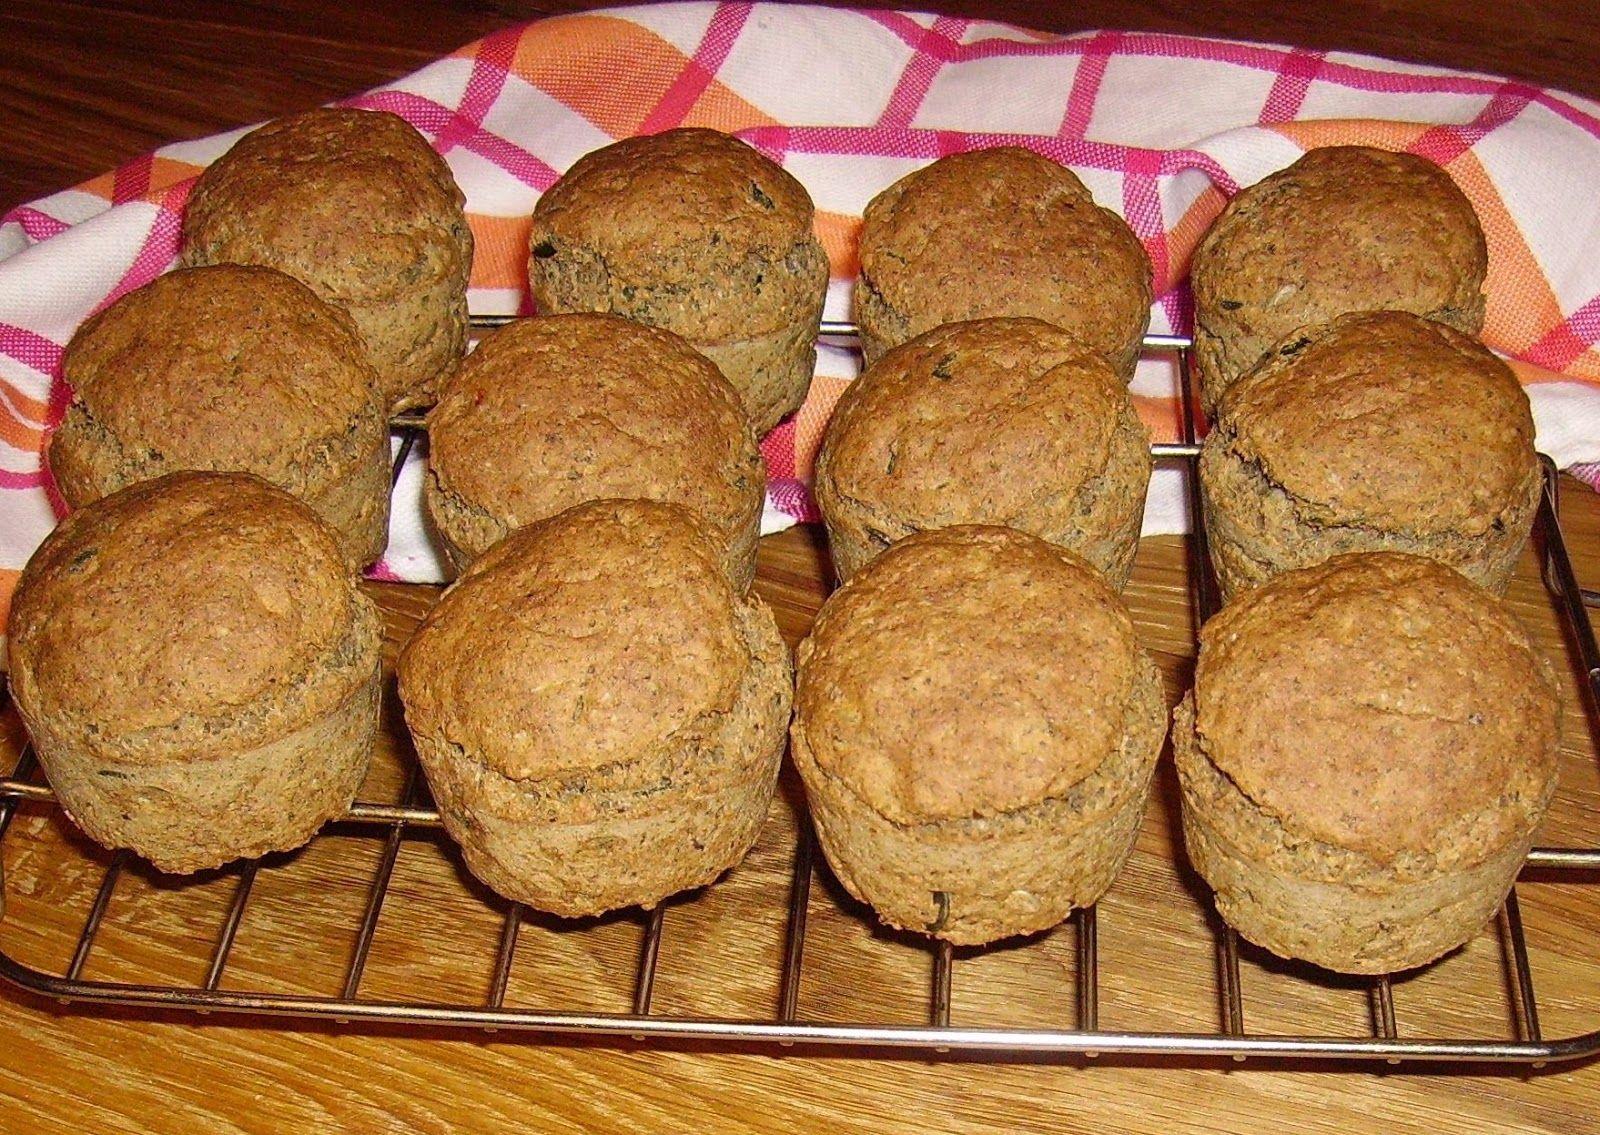 Würzige Muffins